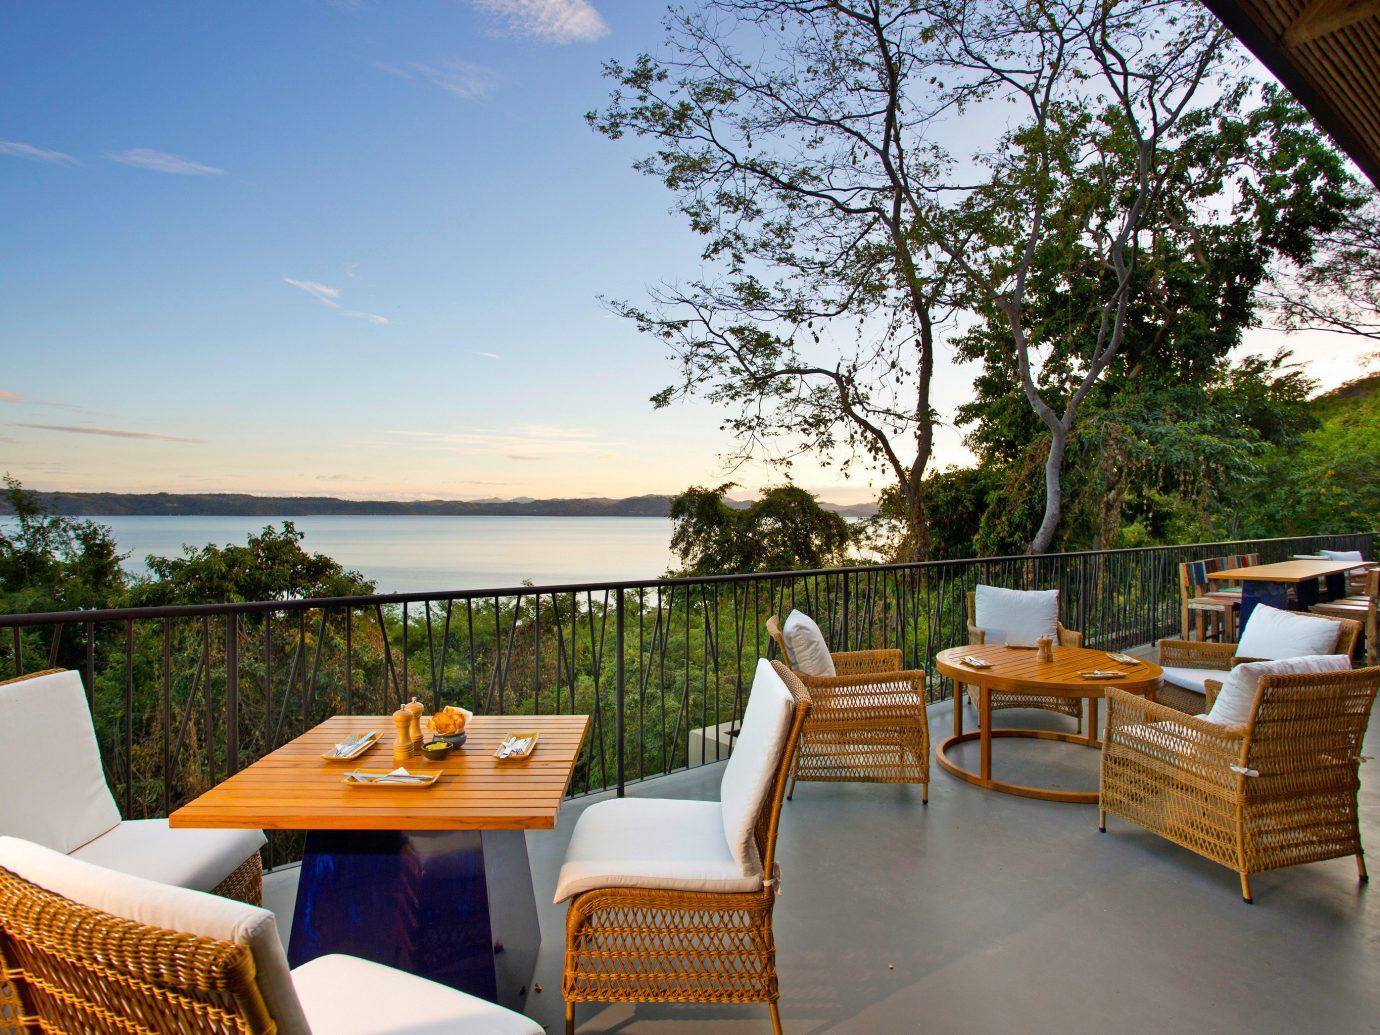 Dining Drink Eat Modern Resort tree chair property leisure Villa home cottage backyard overlooking